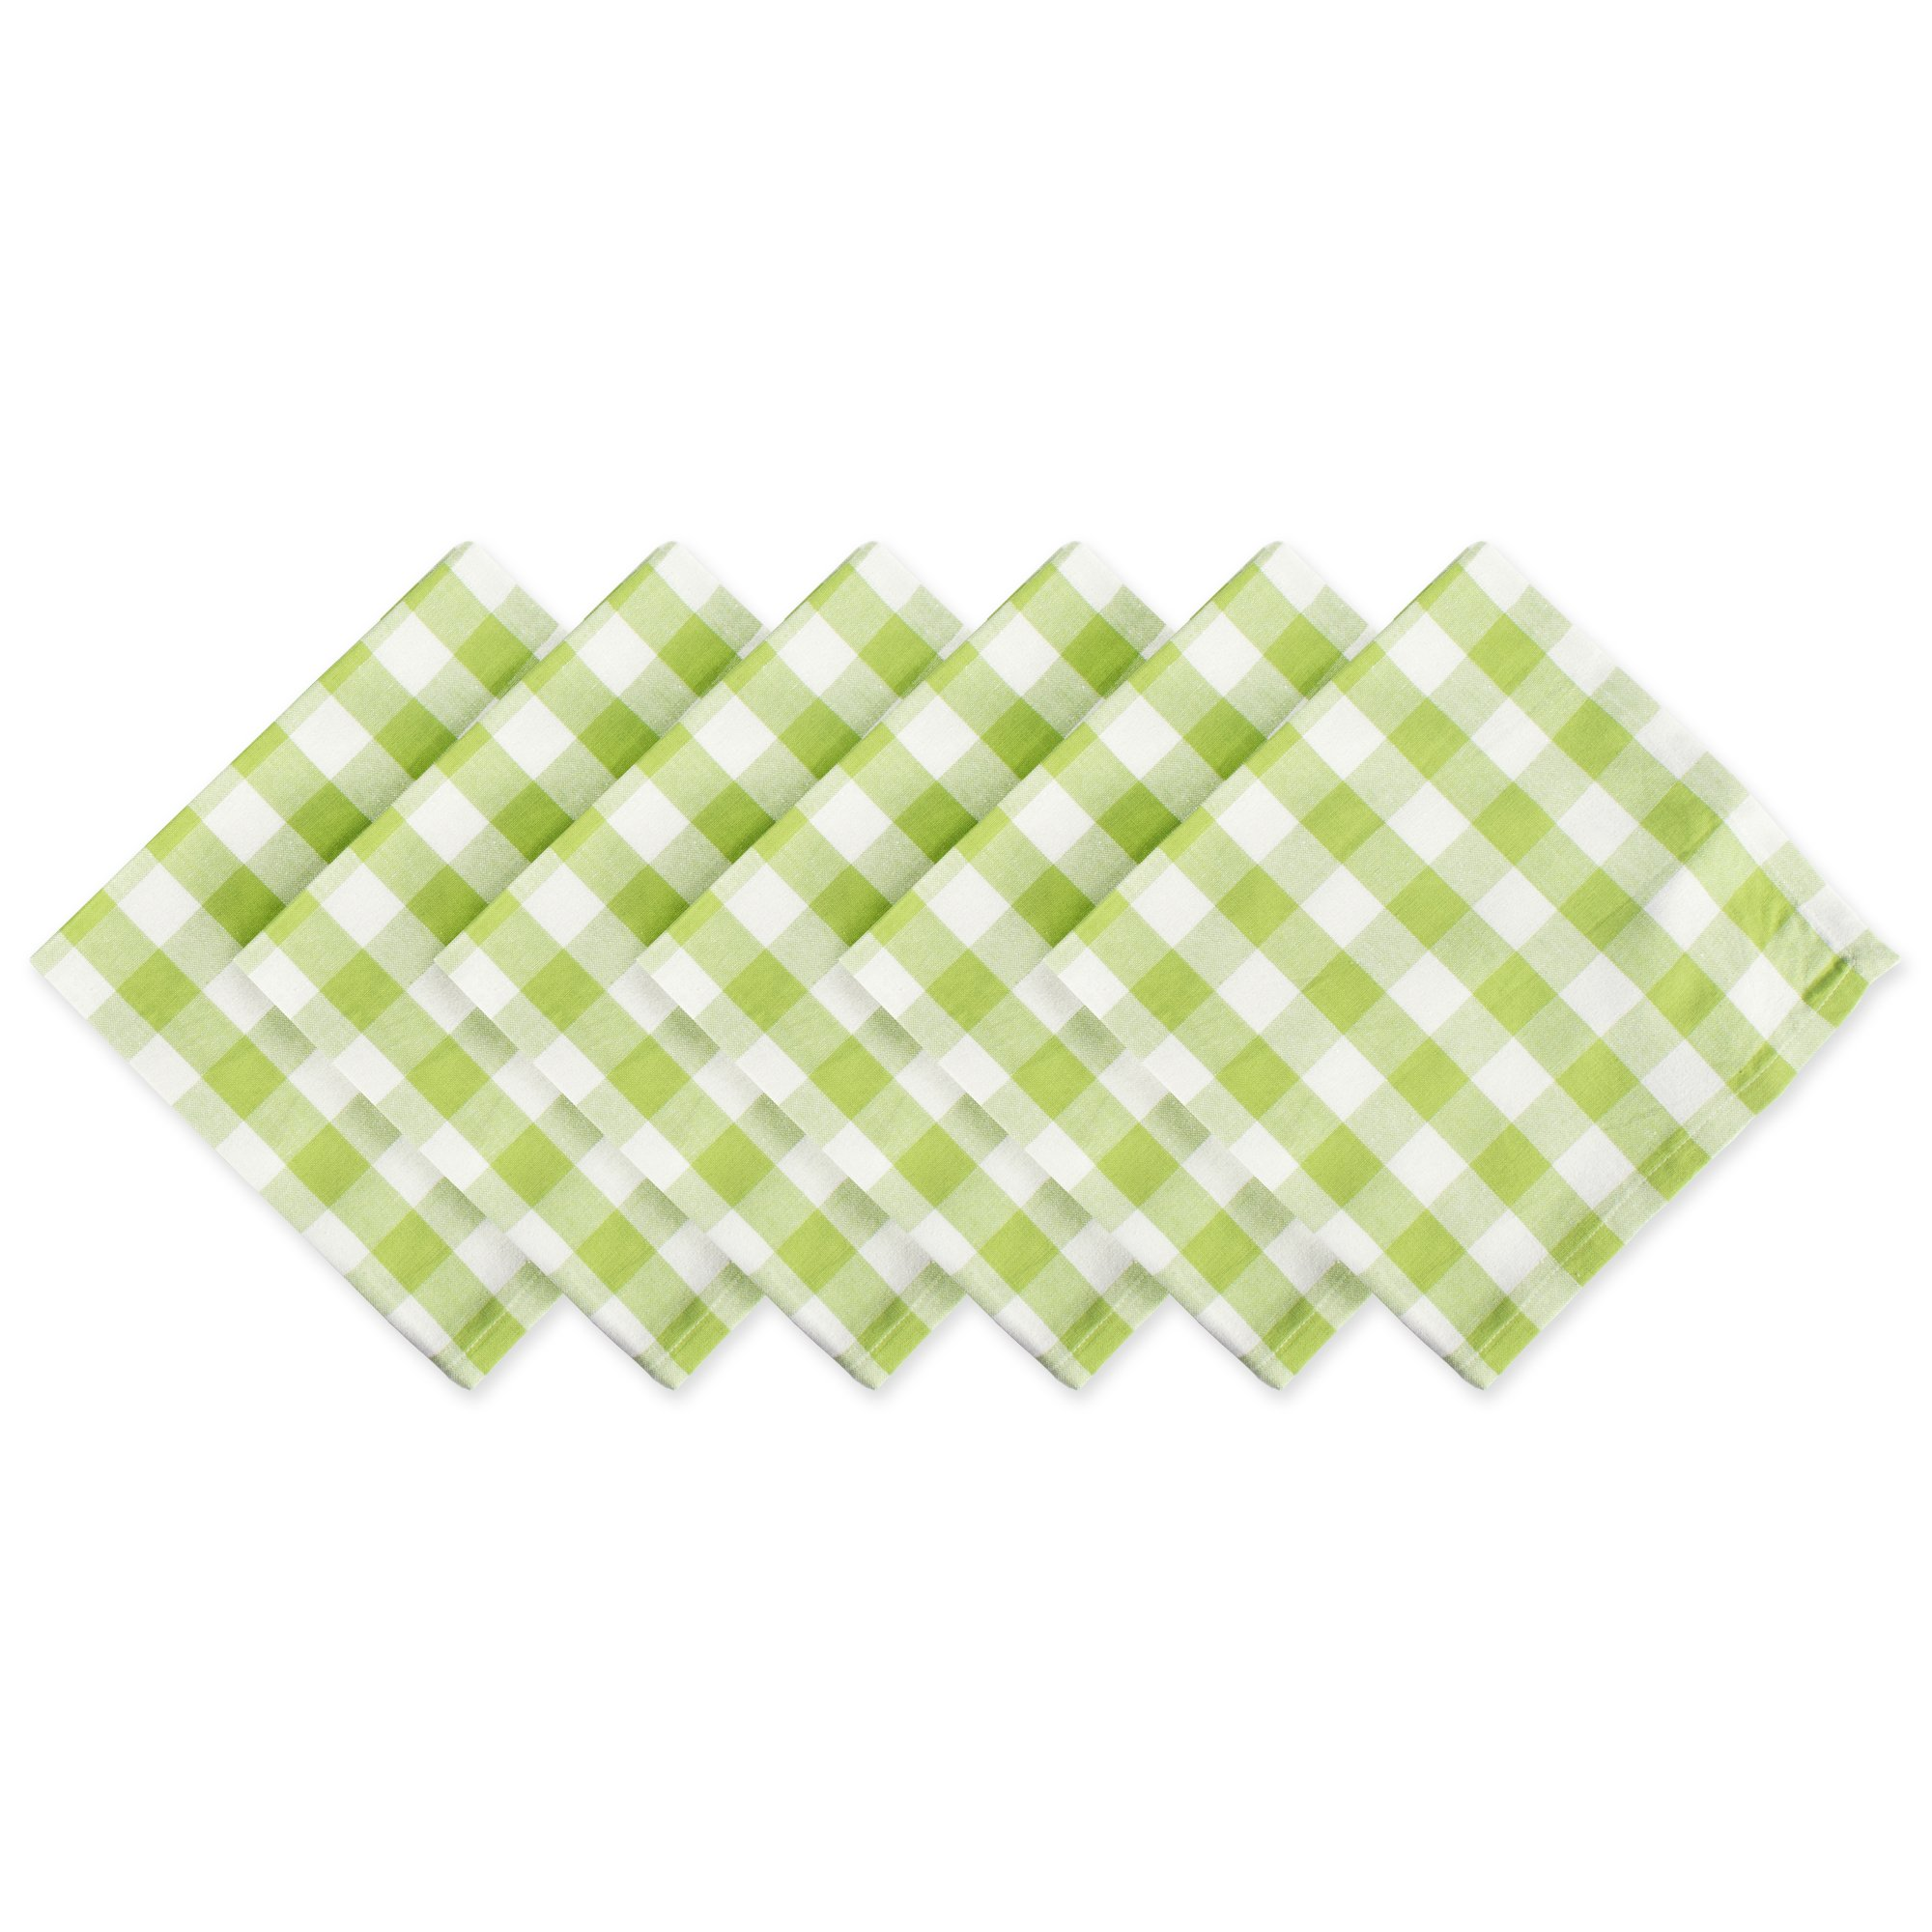 DII 100% Cotton, Oversized Basic Everyday 20x 20 Napkin, Set of 6, Green Apple Check